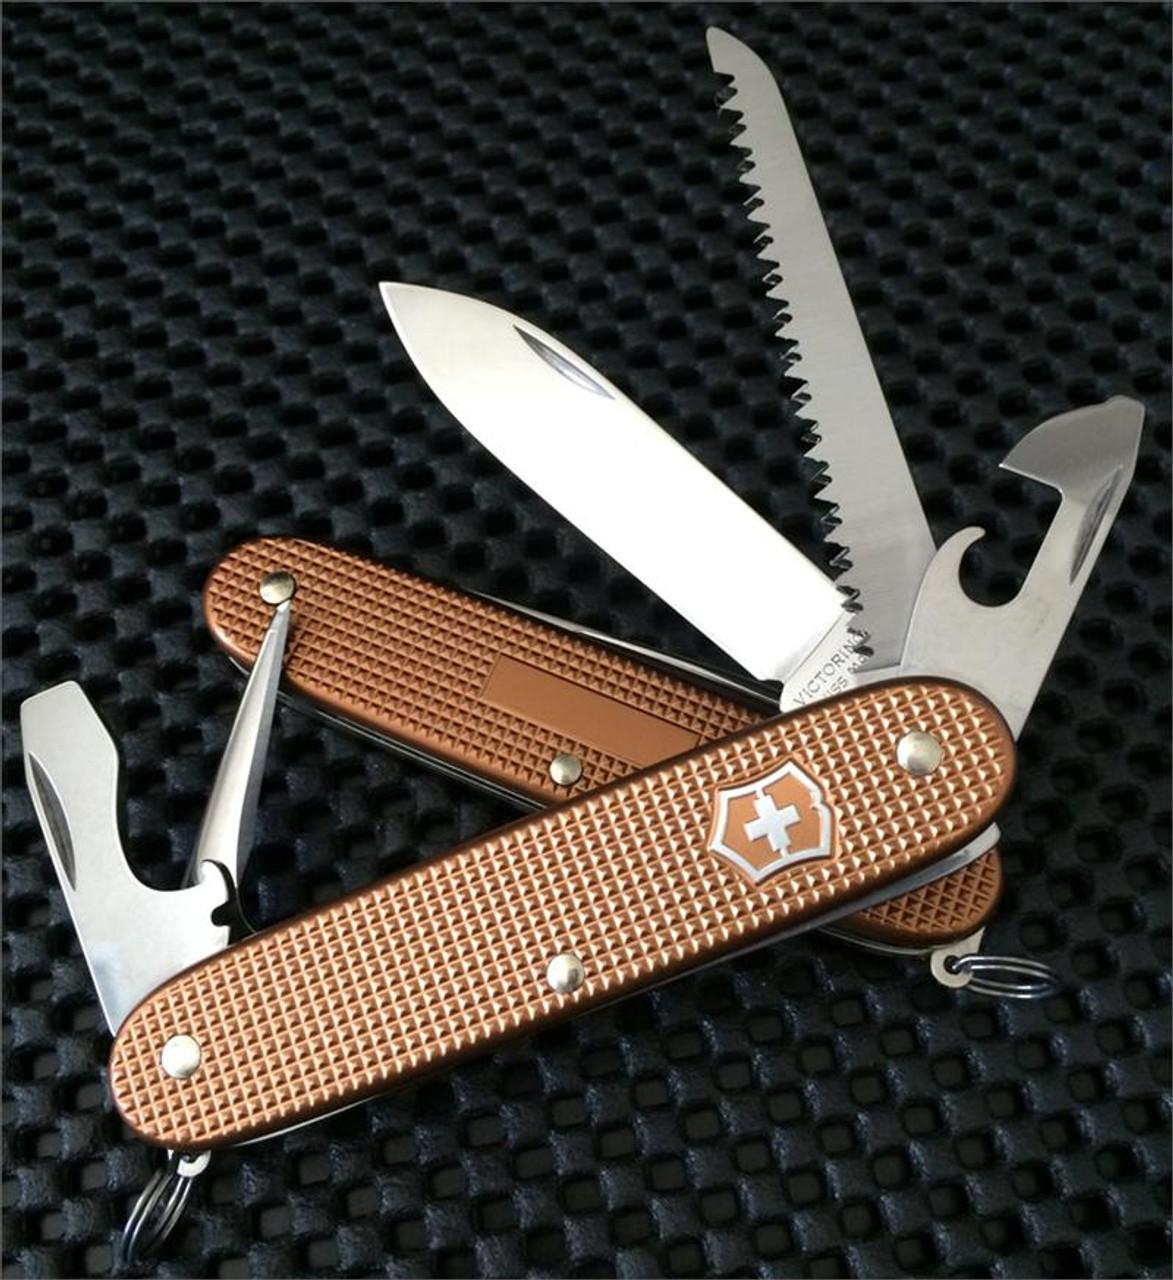 Victorinox 0 8241 79RC Farmer - Copper ALOX 93mm - LIMITED